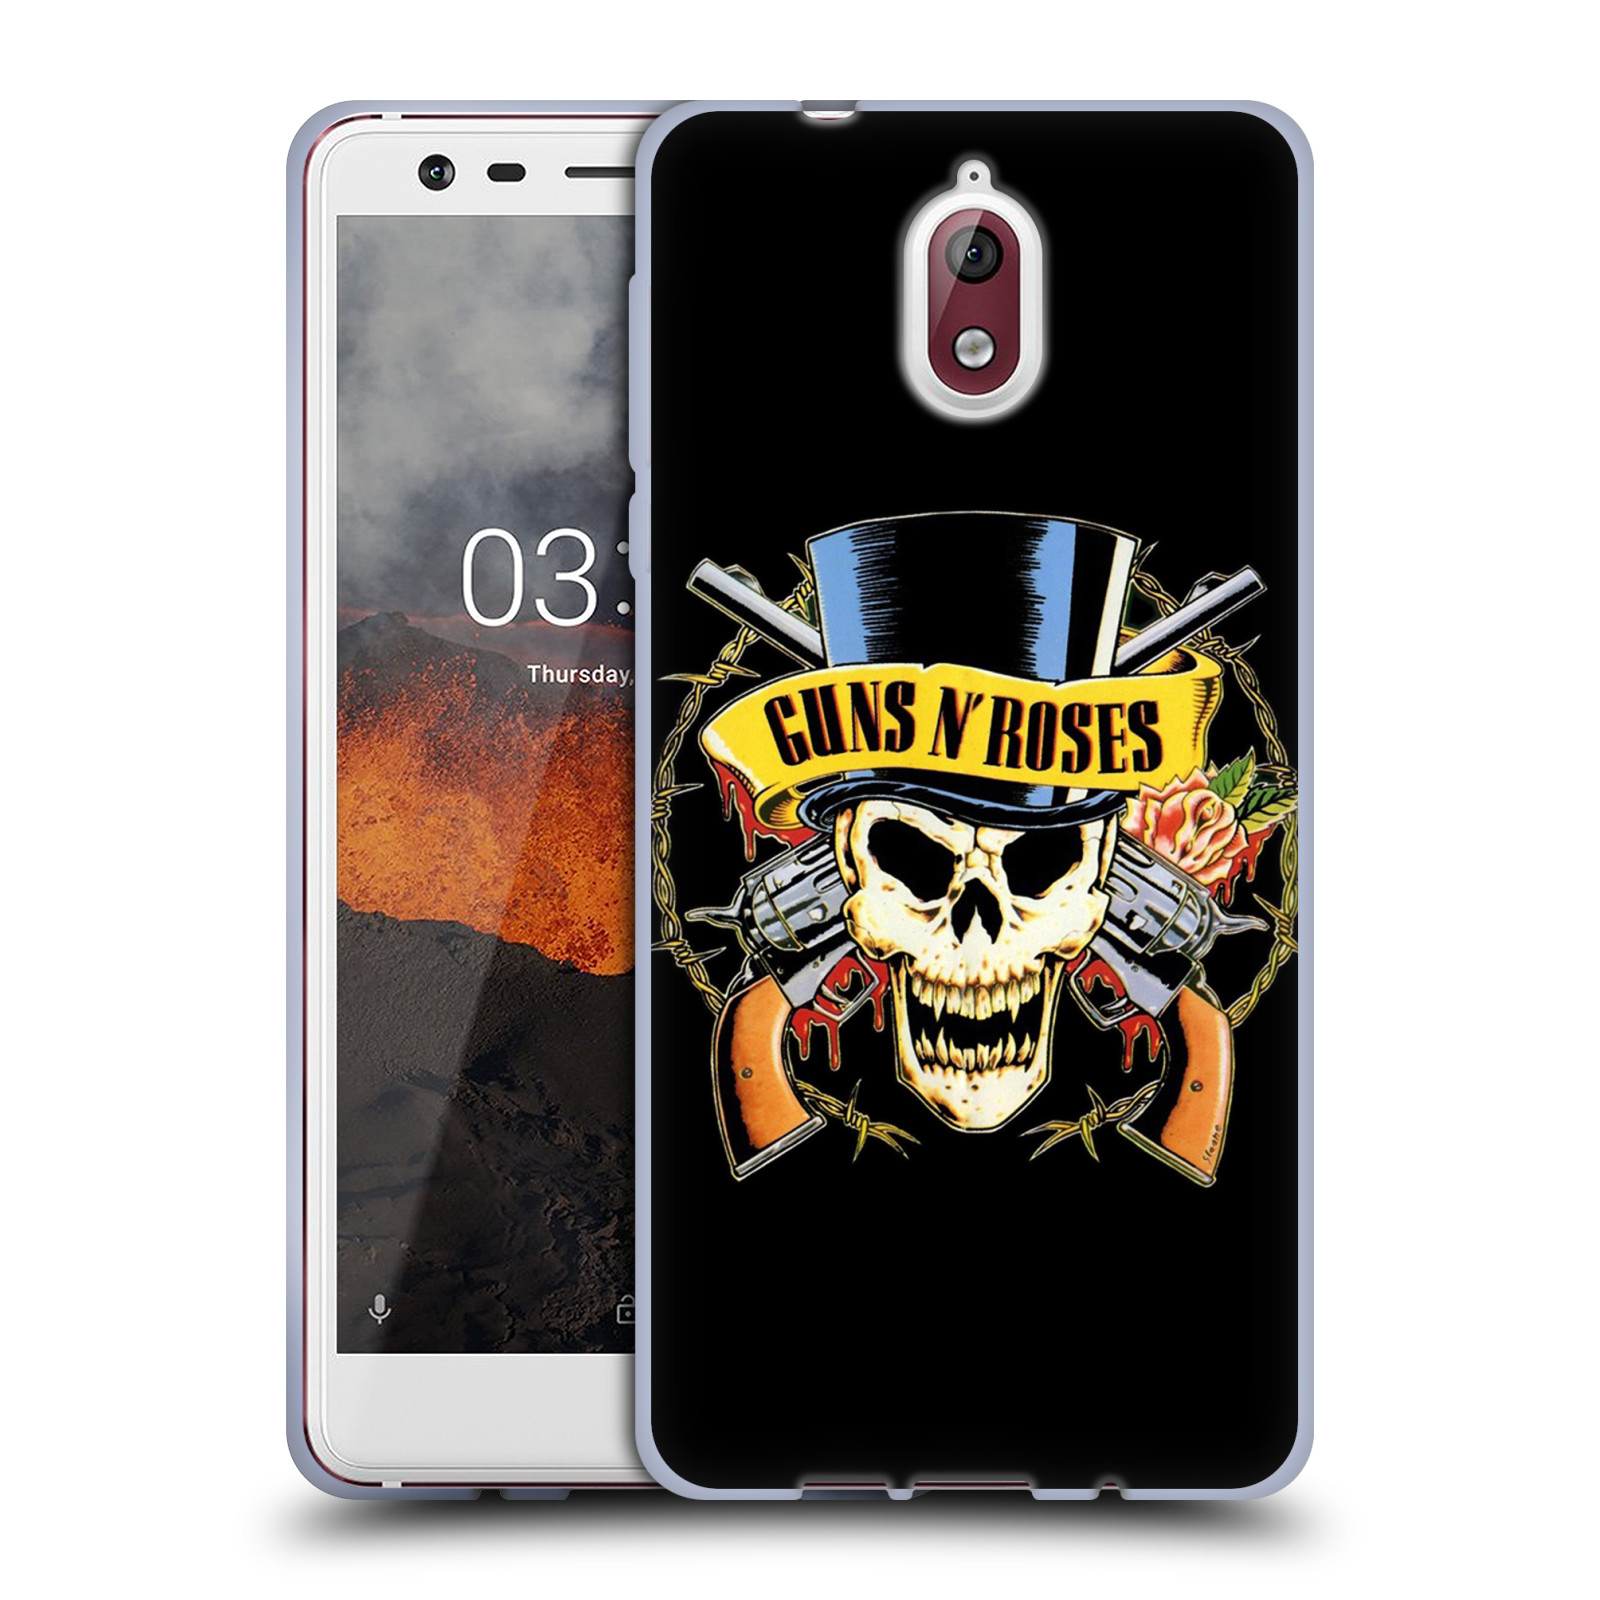 Silikonové pouzdro na mobil Nokia 3.1 - Head Case - Guns N' Roses - Lebka